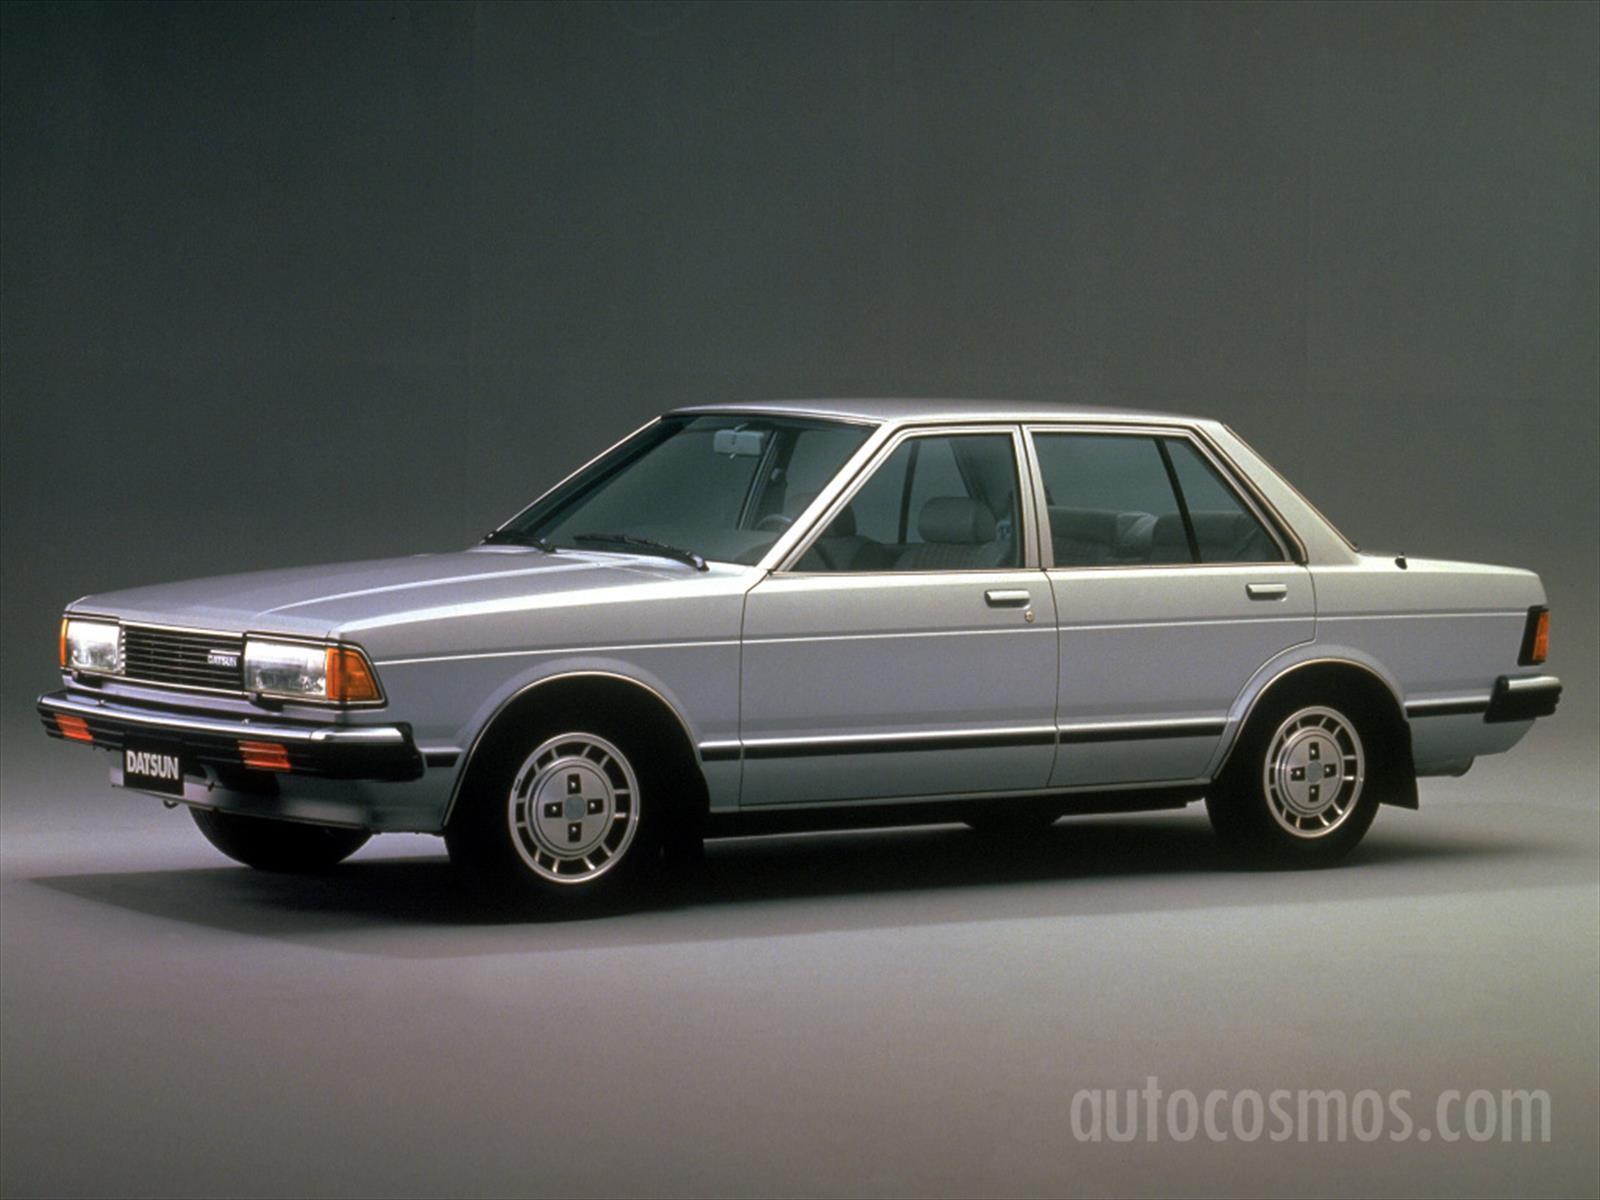 Datsun Bluebird Cars For Sale